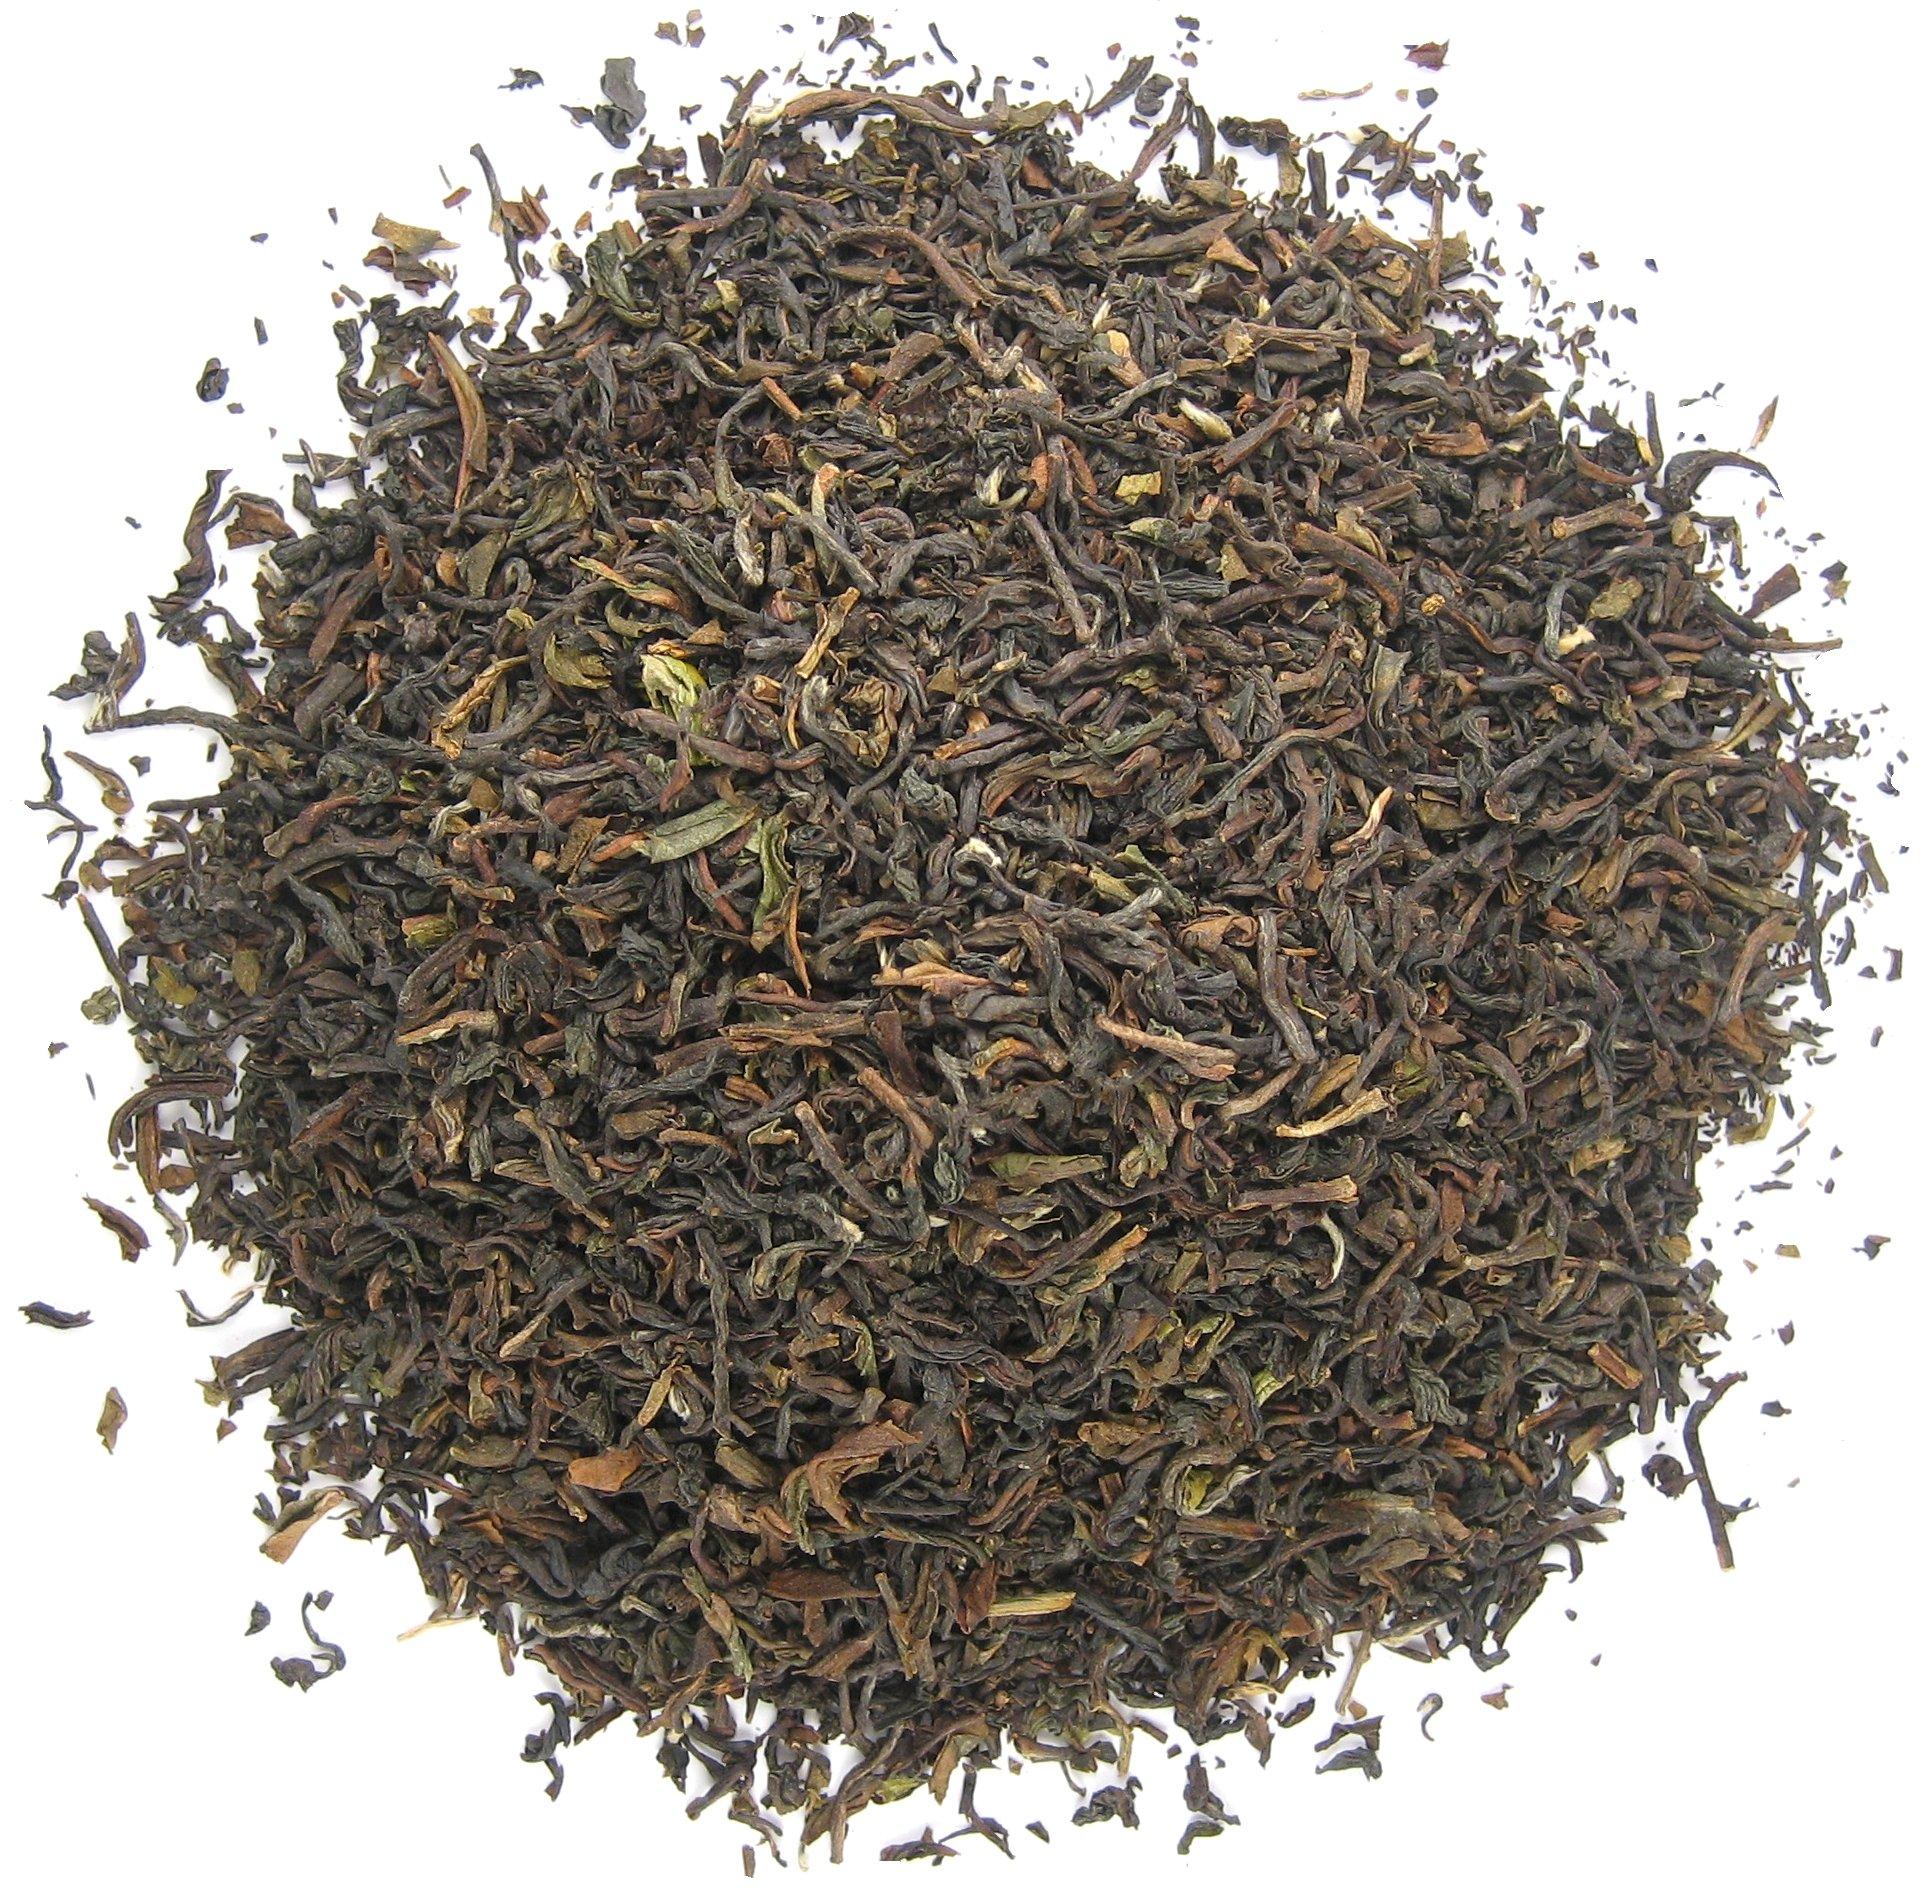 Assam-Tee-SF-TGFOP-aus-Teeinitiative-1-Kg-rckstandskontr